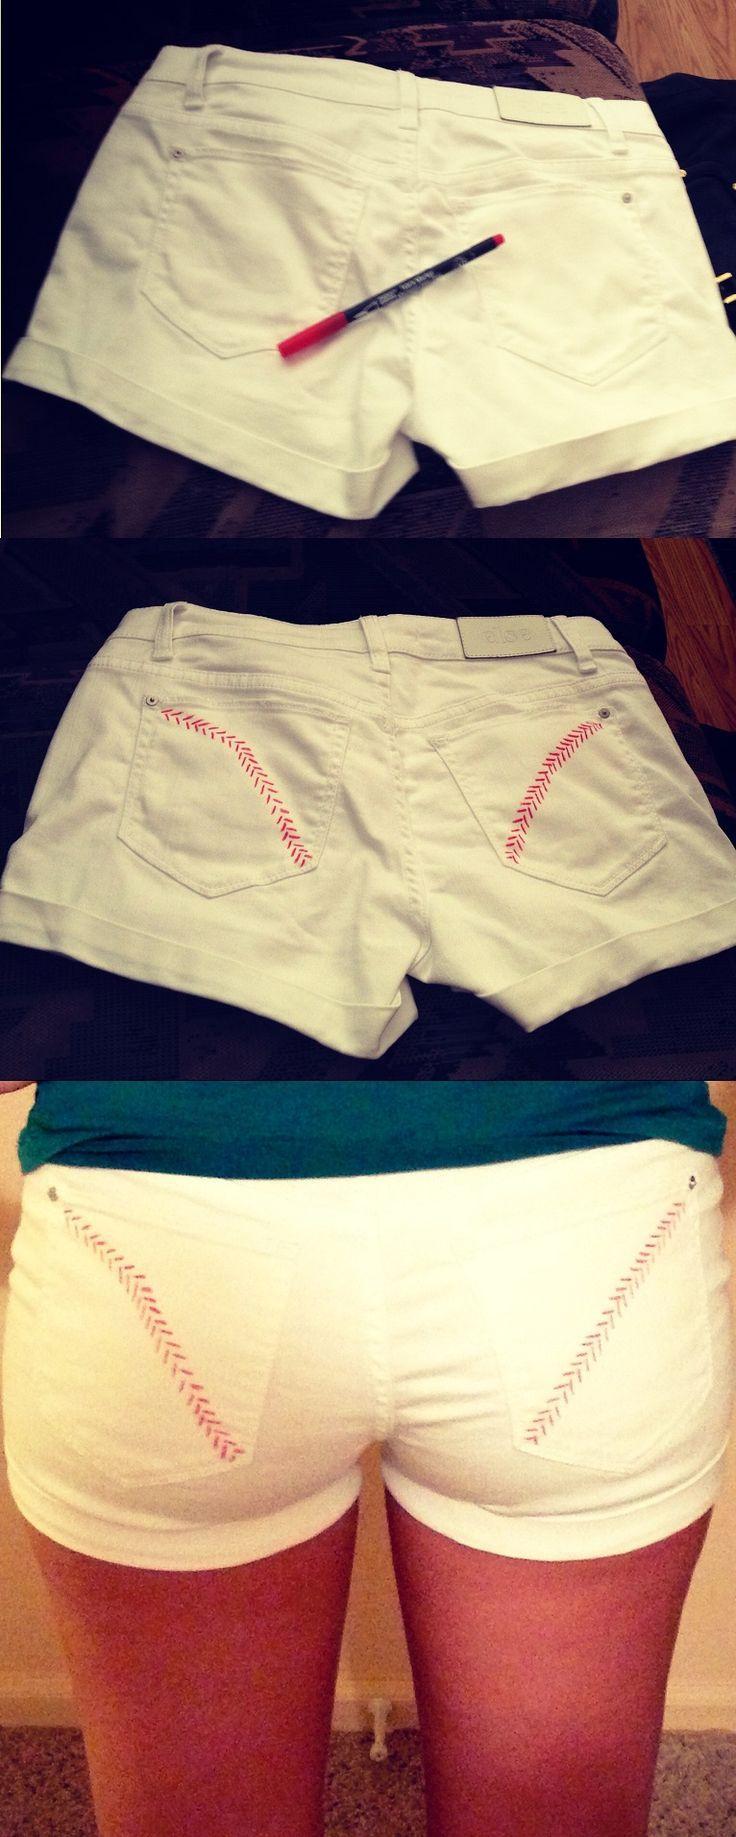 Super easy baseball craft - baseball stitch pocket shorts! Click for the DIY tutorial!